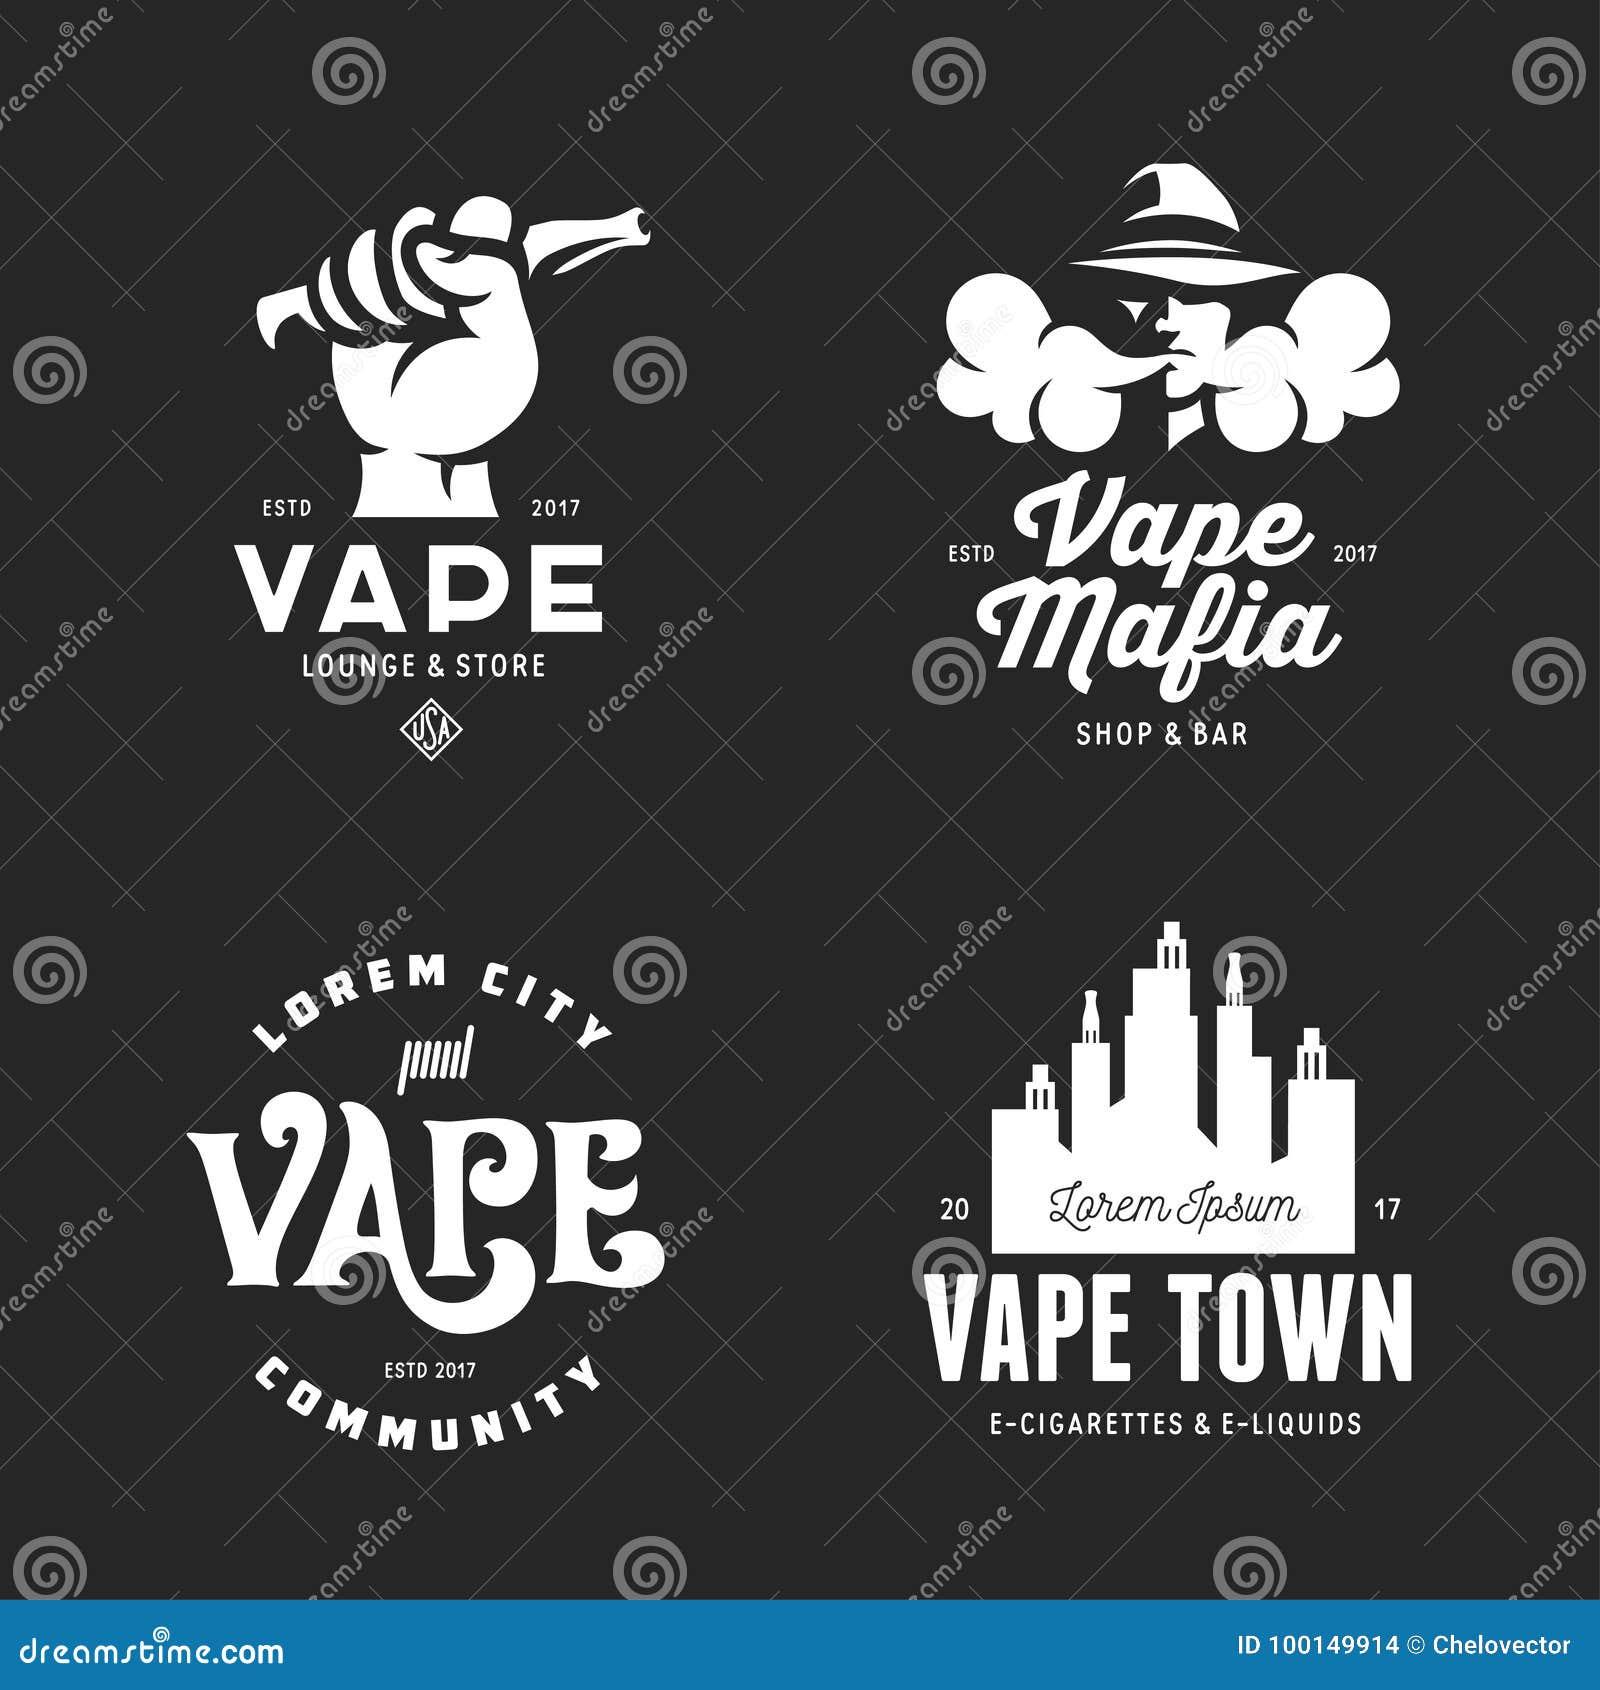 Vape商店标记象征徽章被设置 传染媒介葡萄酒例证